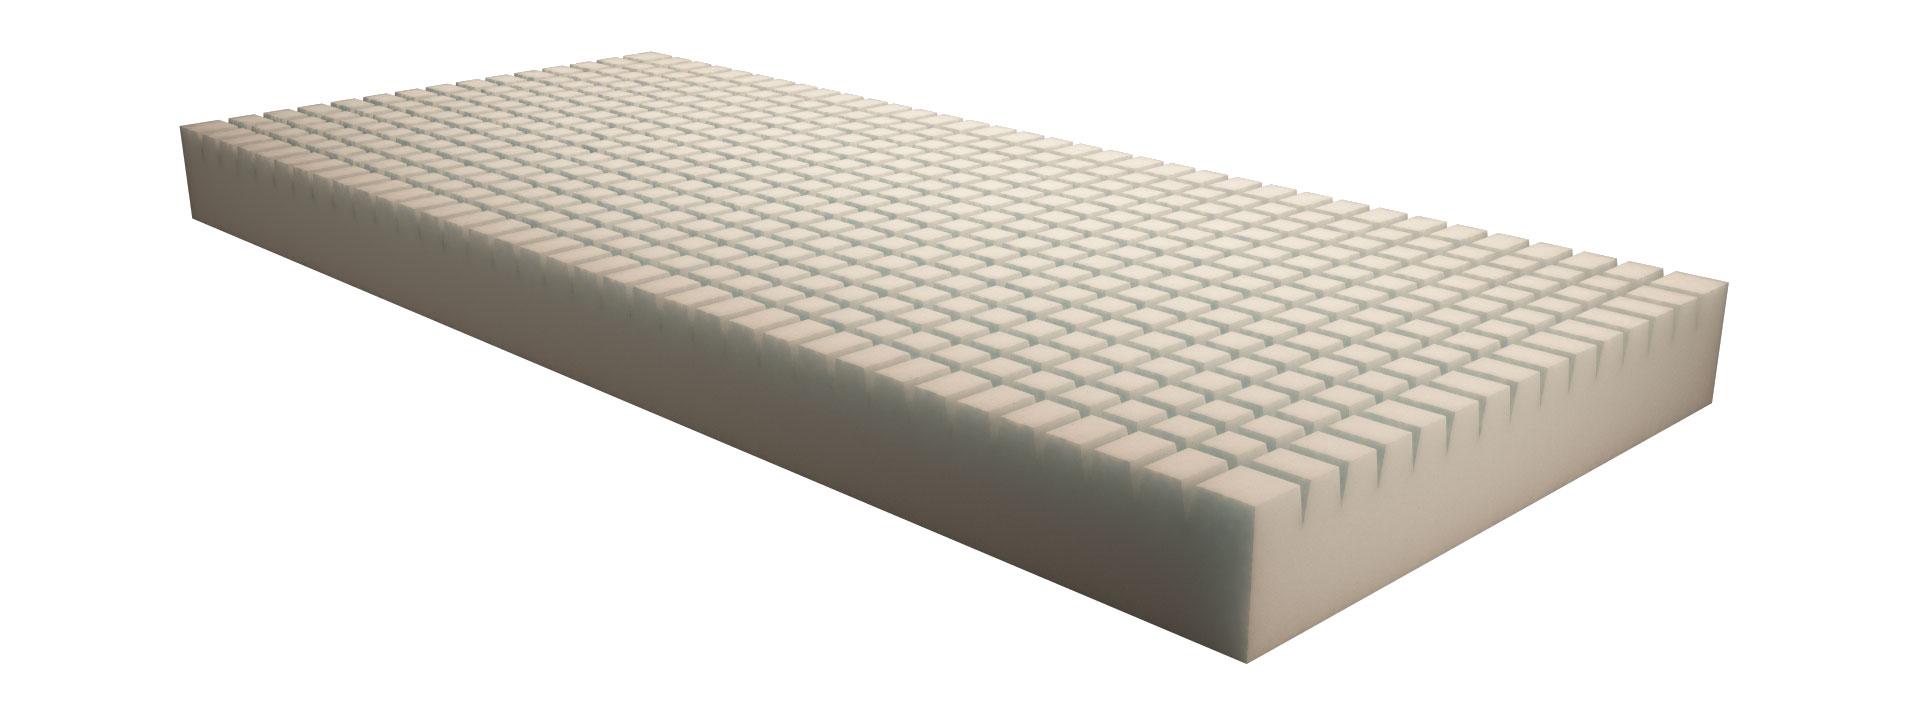 Materasso A Memoria Di Forma.Materasso Flex Antidecubito Statico In Schiuma Espansa Poliuretanica